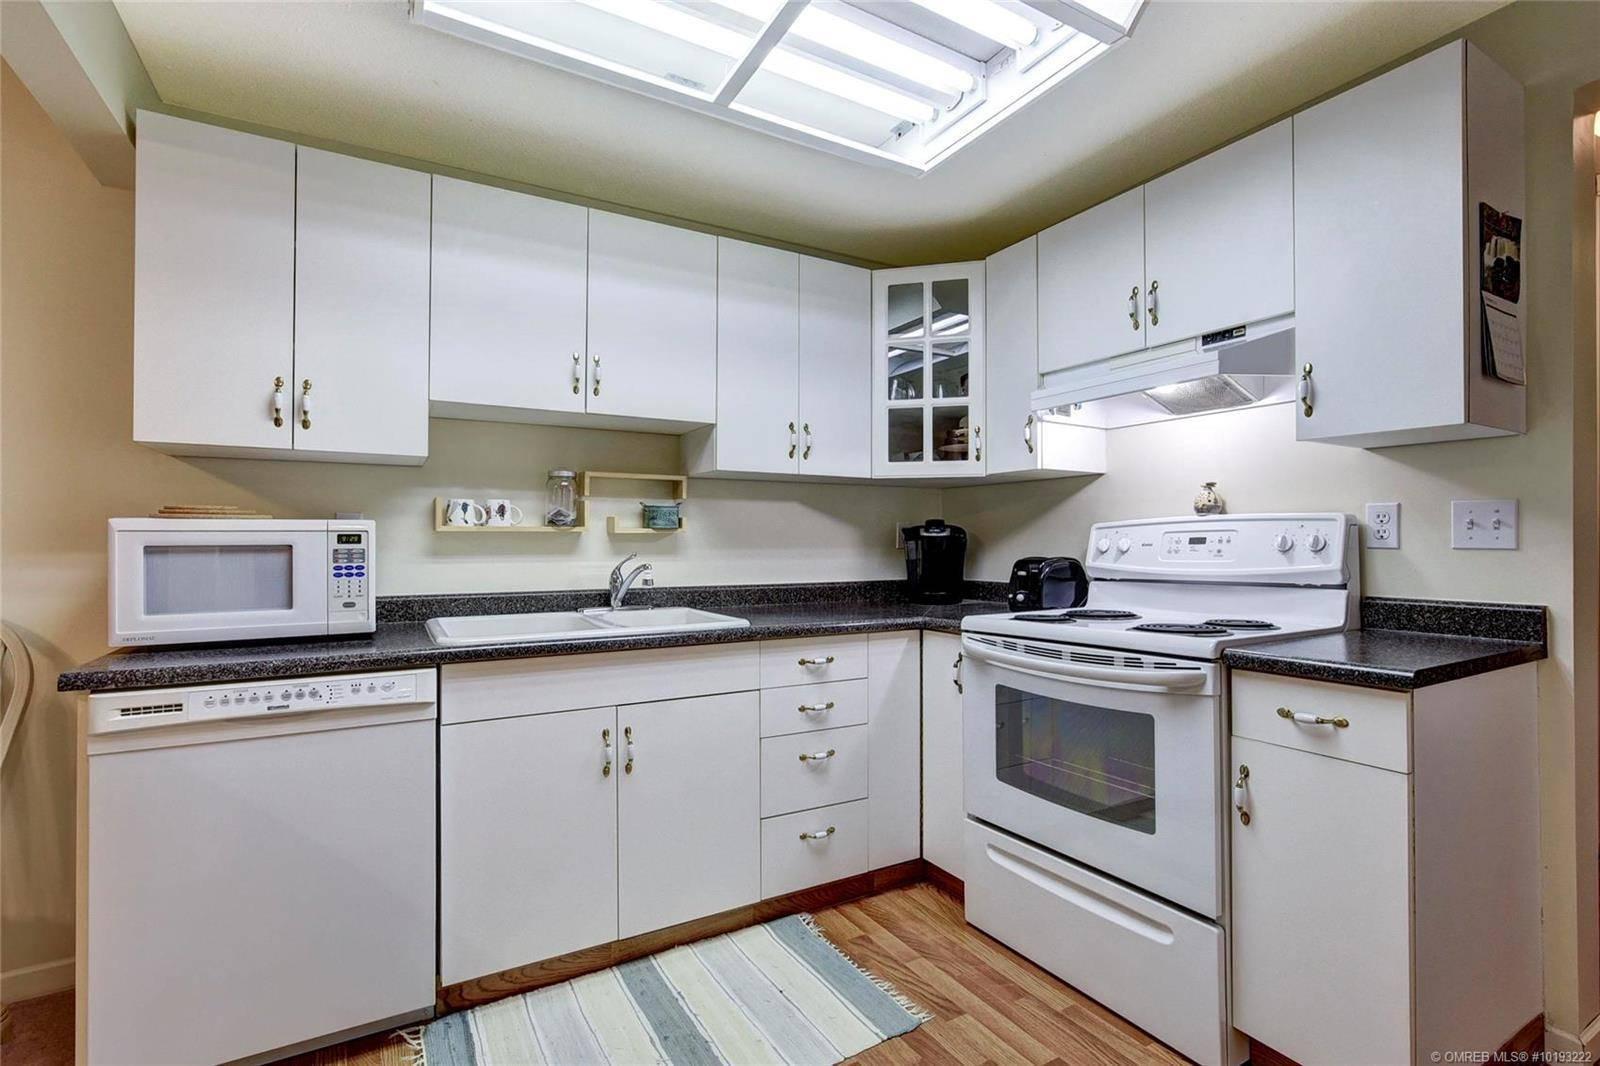 Condo for sale at 727 Houghton Rd Unit 110 Kelowna British Columbia - MLS: 10193222